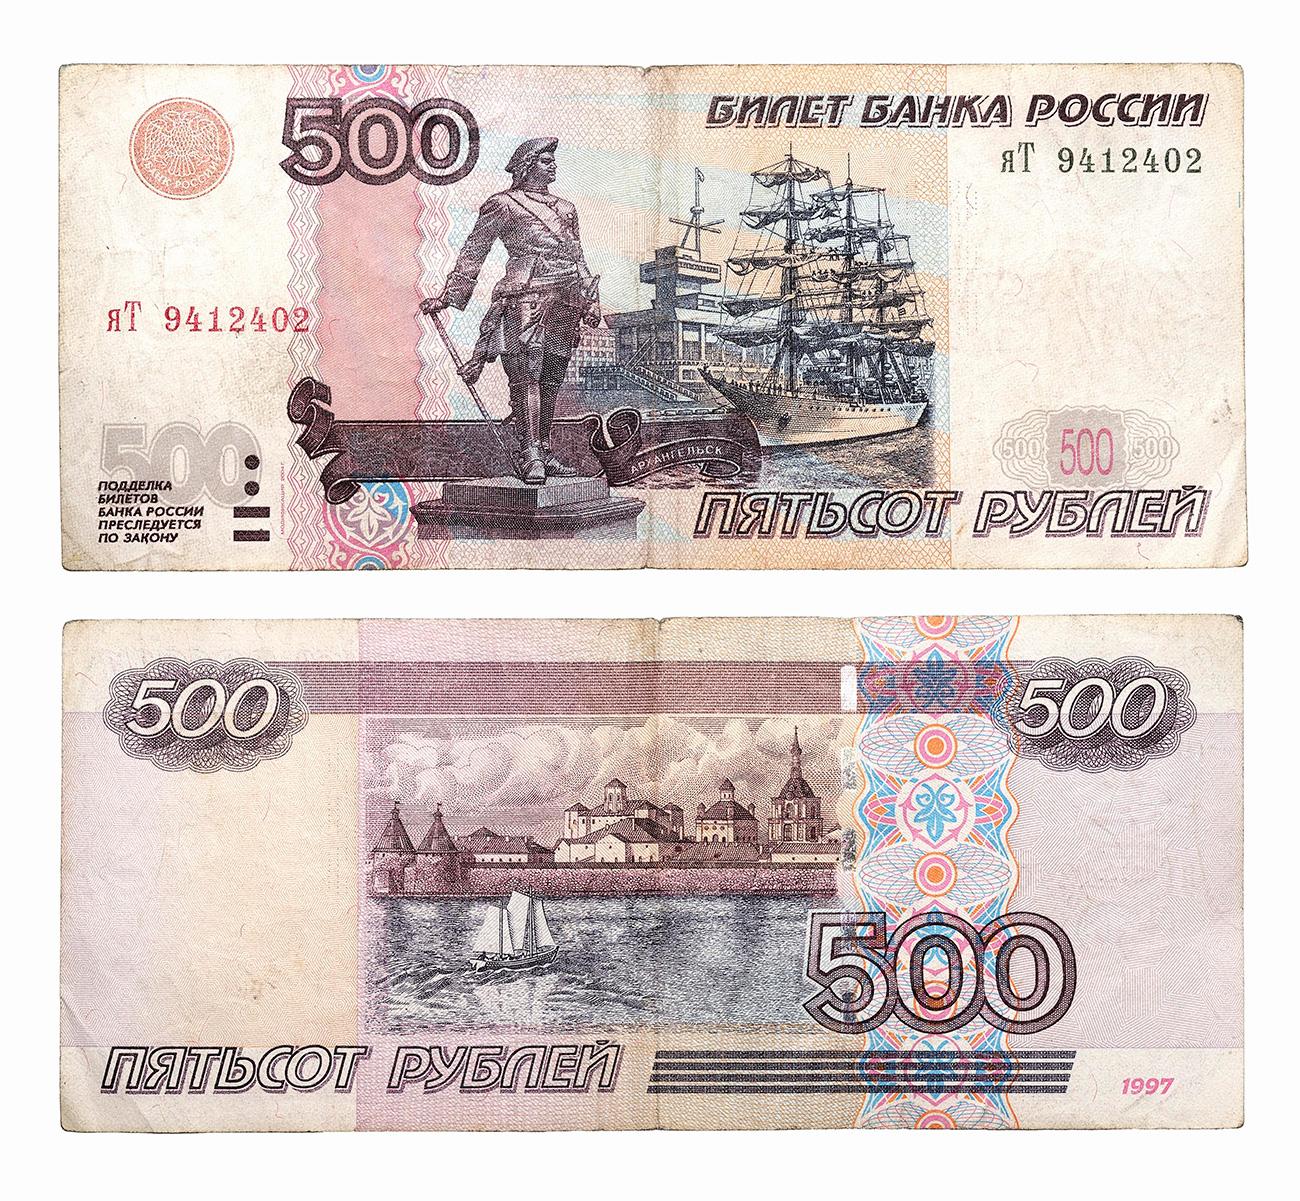 500 rubles / Global Look Press